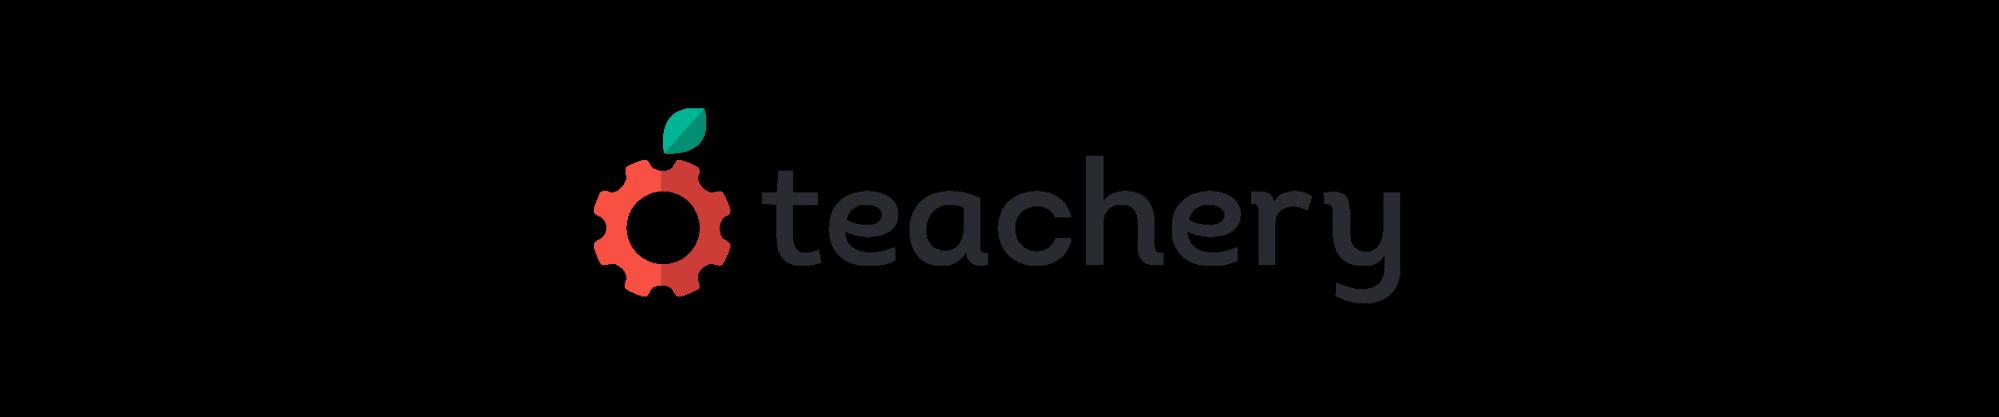 Teachery logo